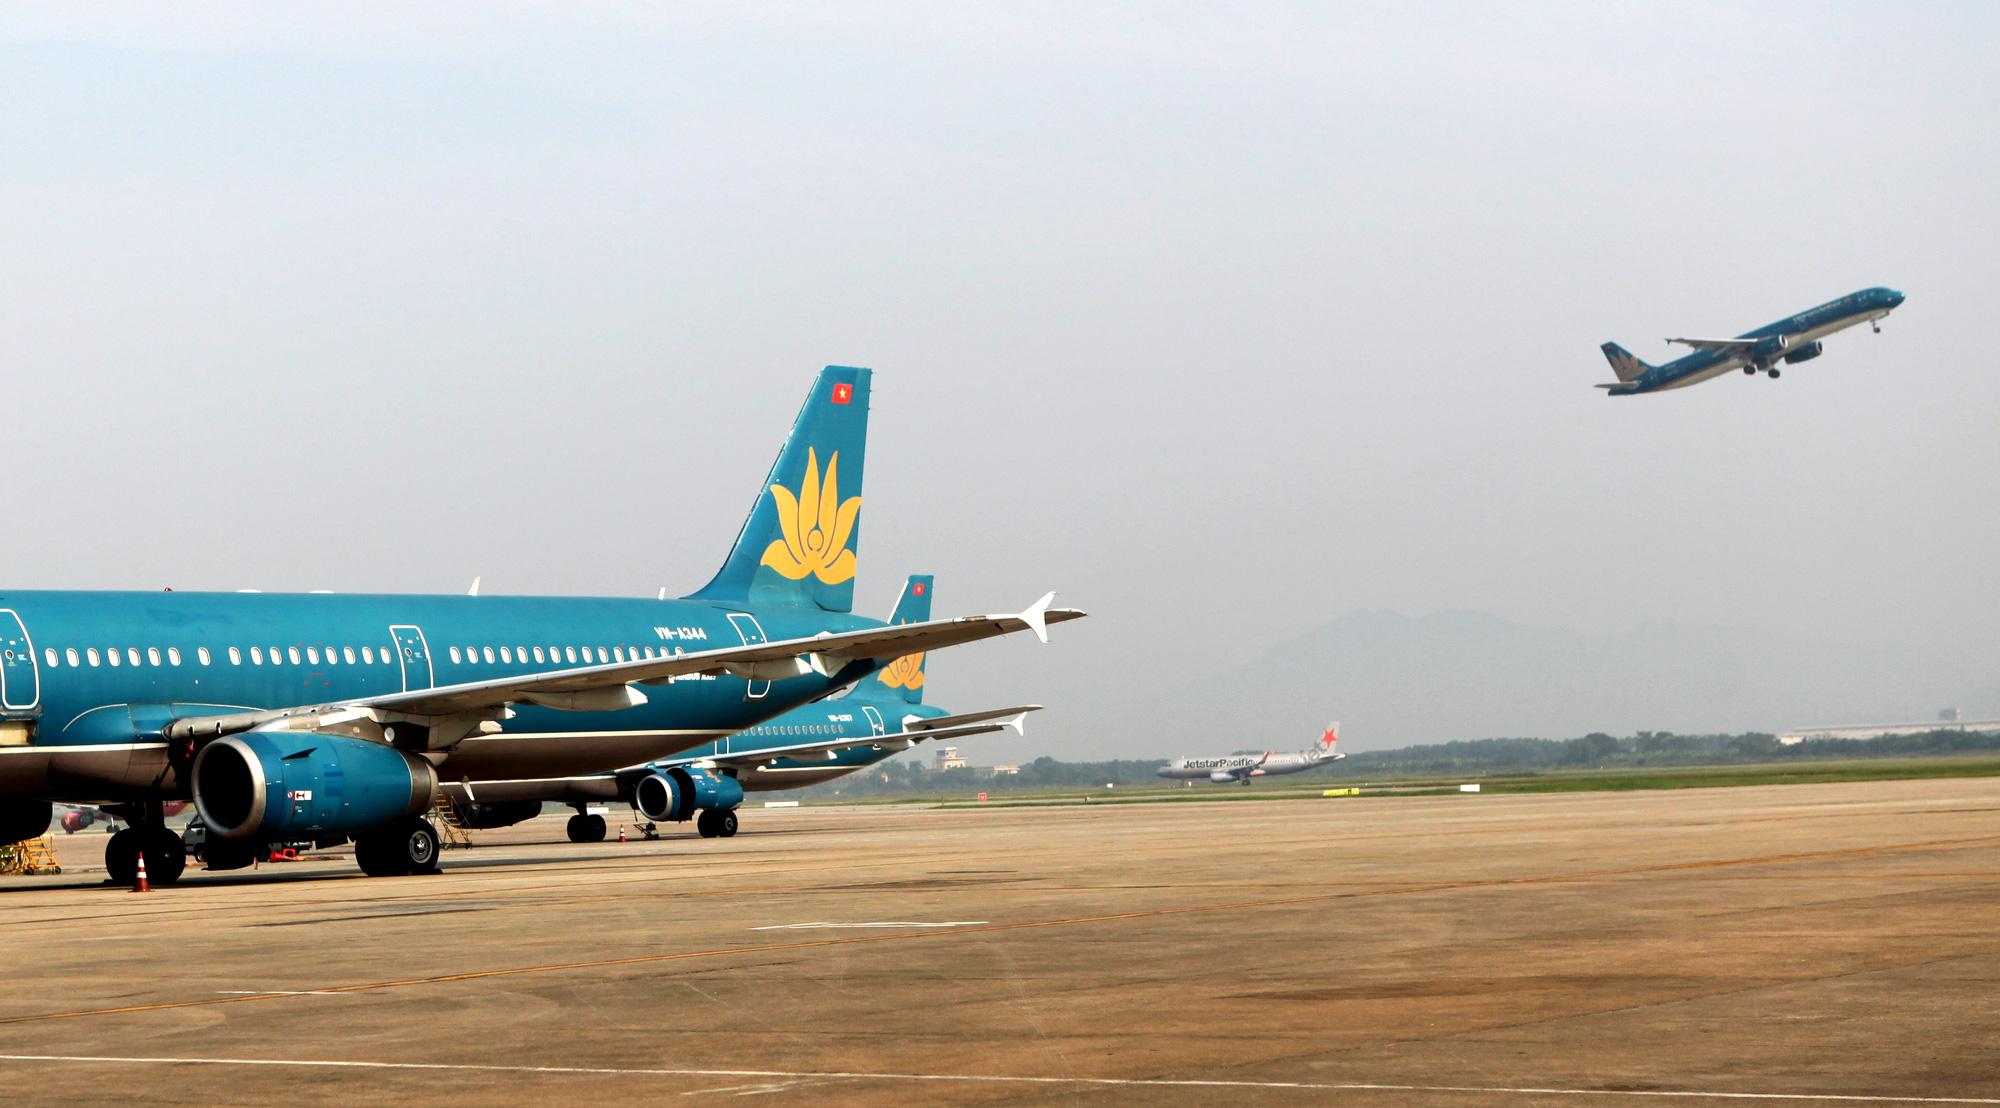 Plane has navigation light broken by bird at Hanoi airport